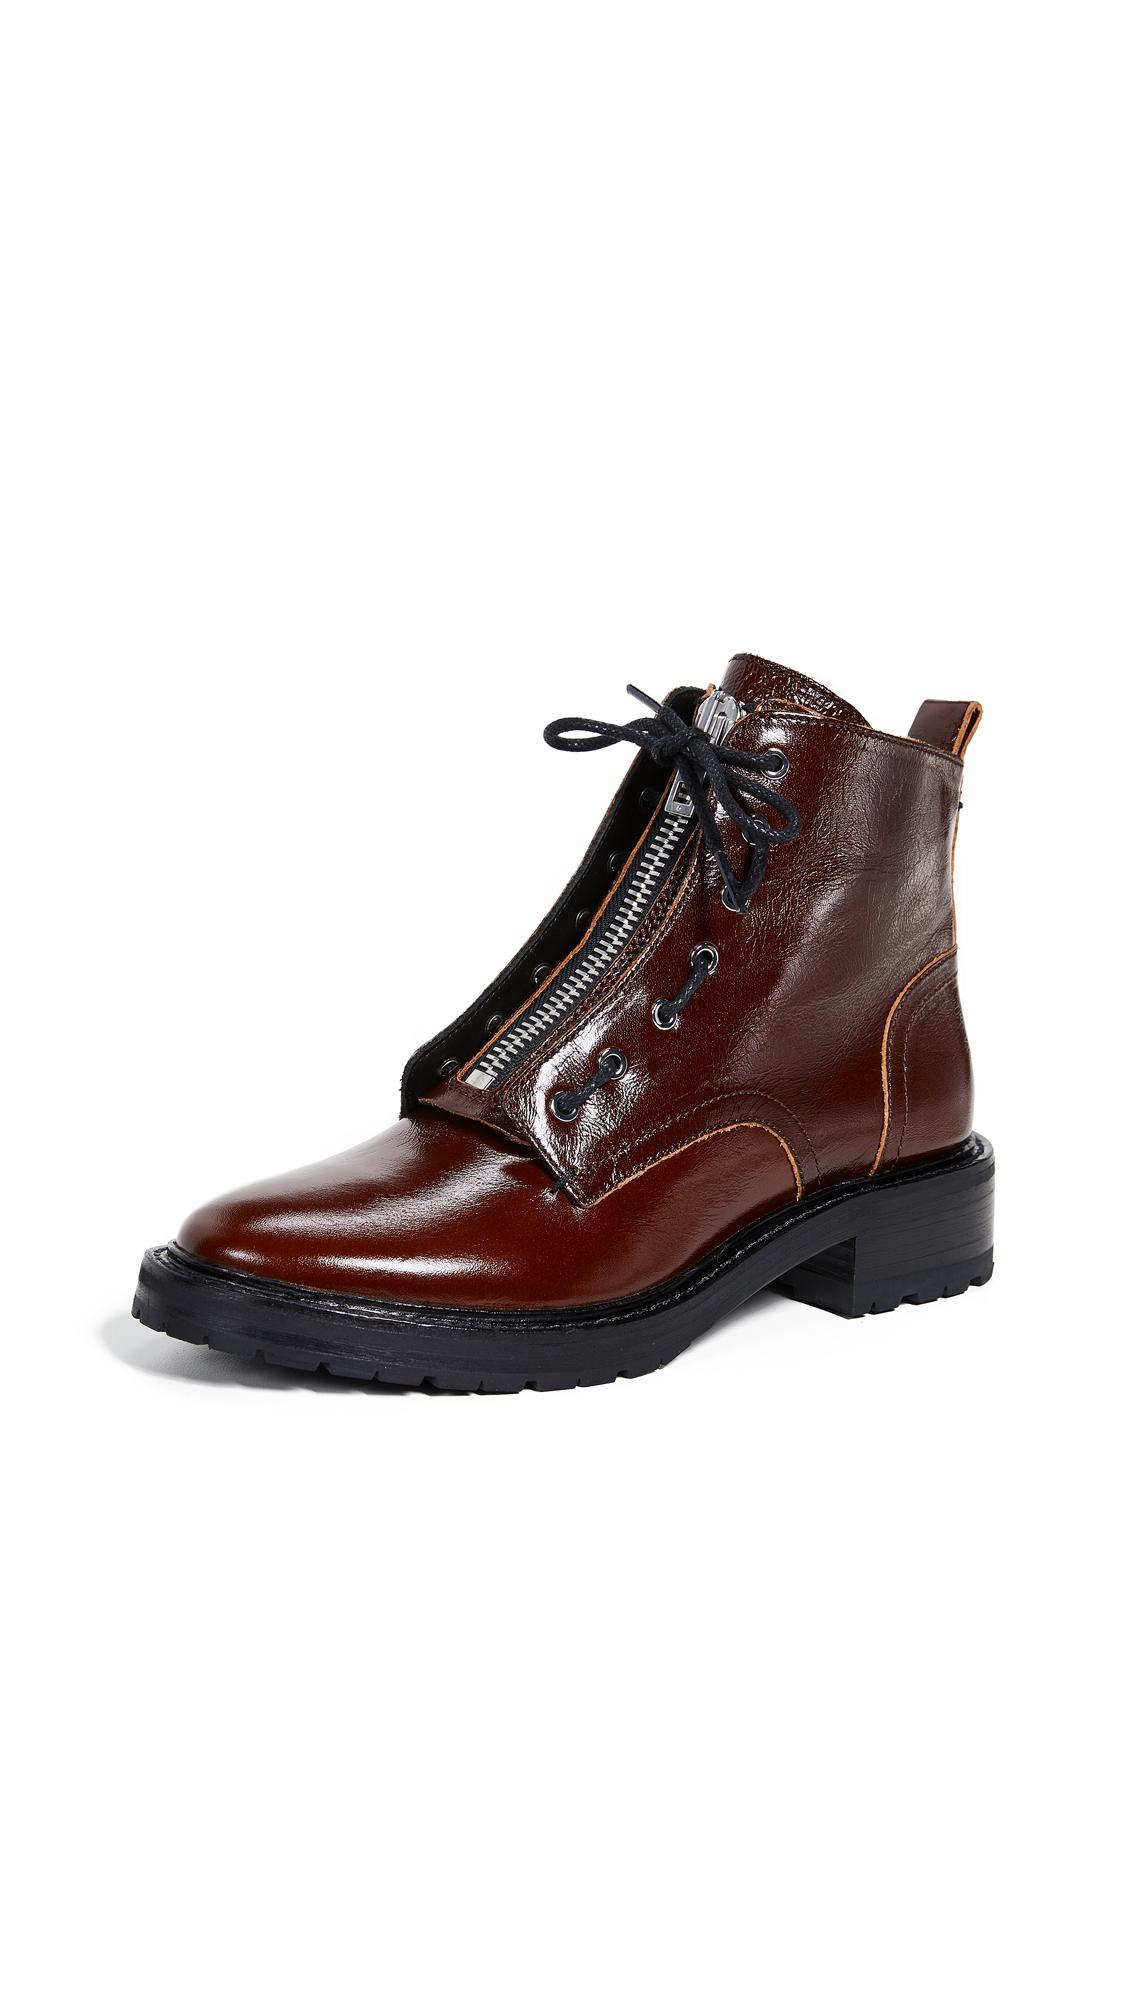 Rag & Bone Cannon Boots - Mahogany